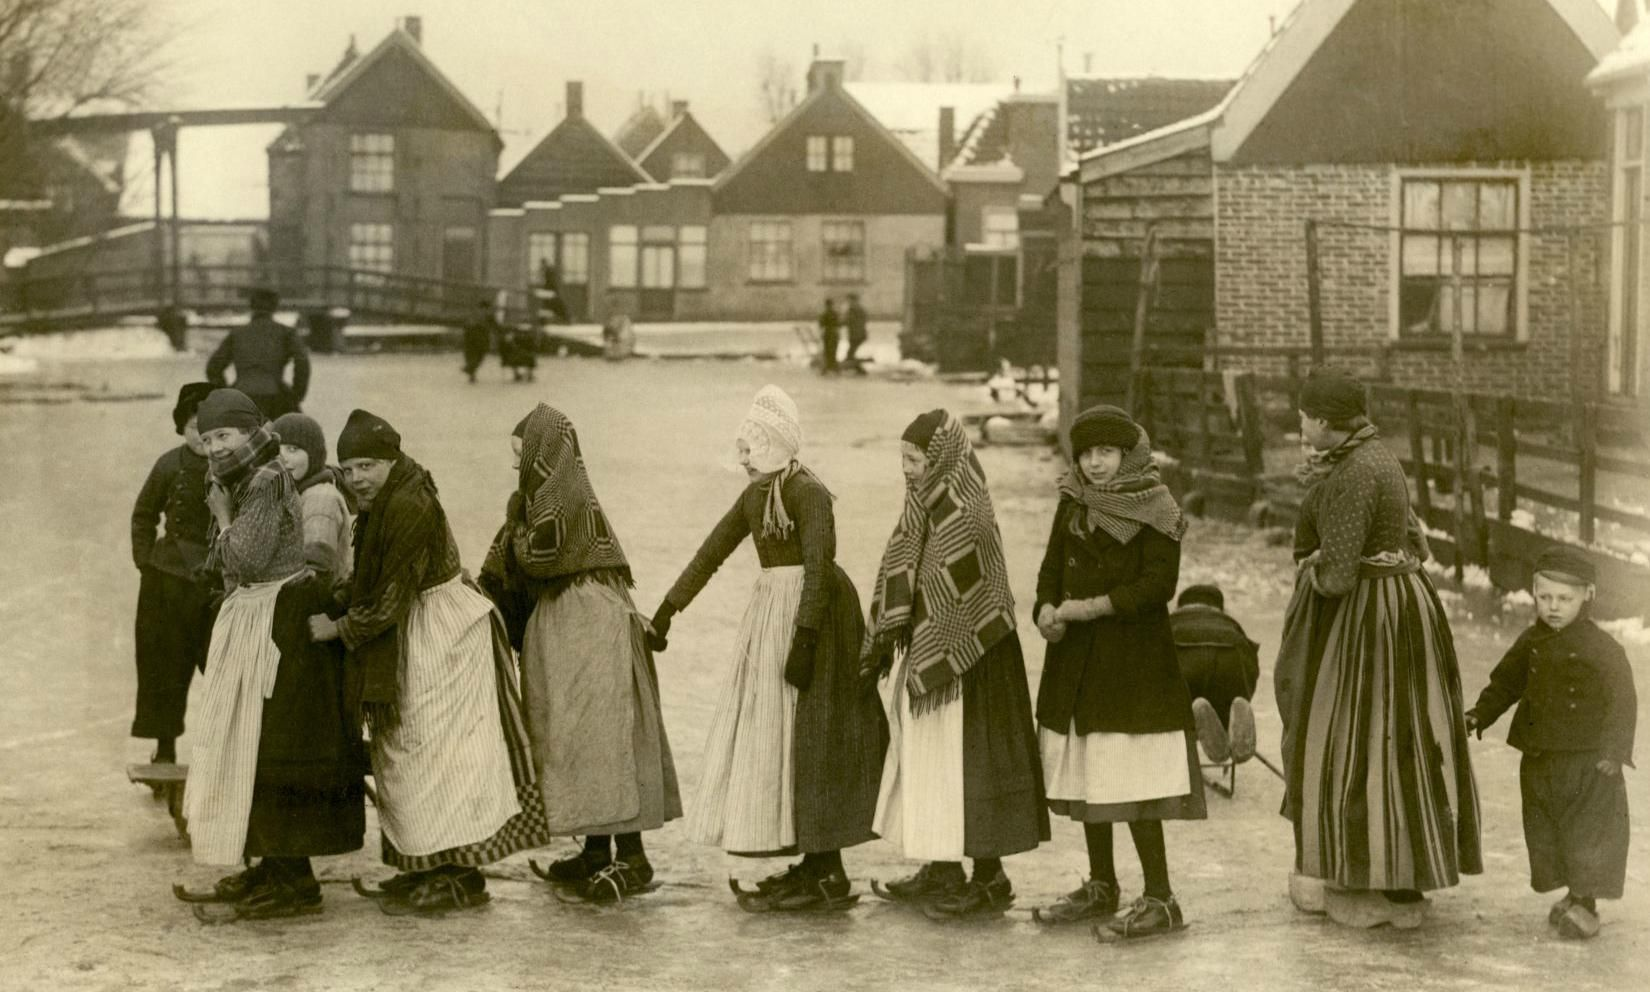 Ice skating - The Netherlands 1919 #NoordHolland #Volendam